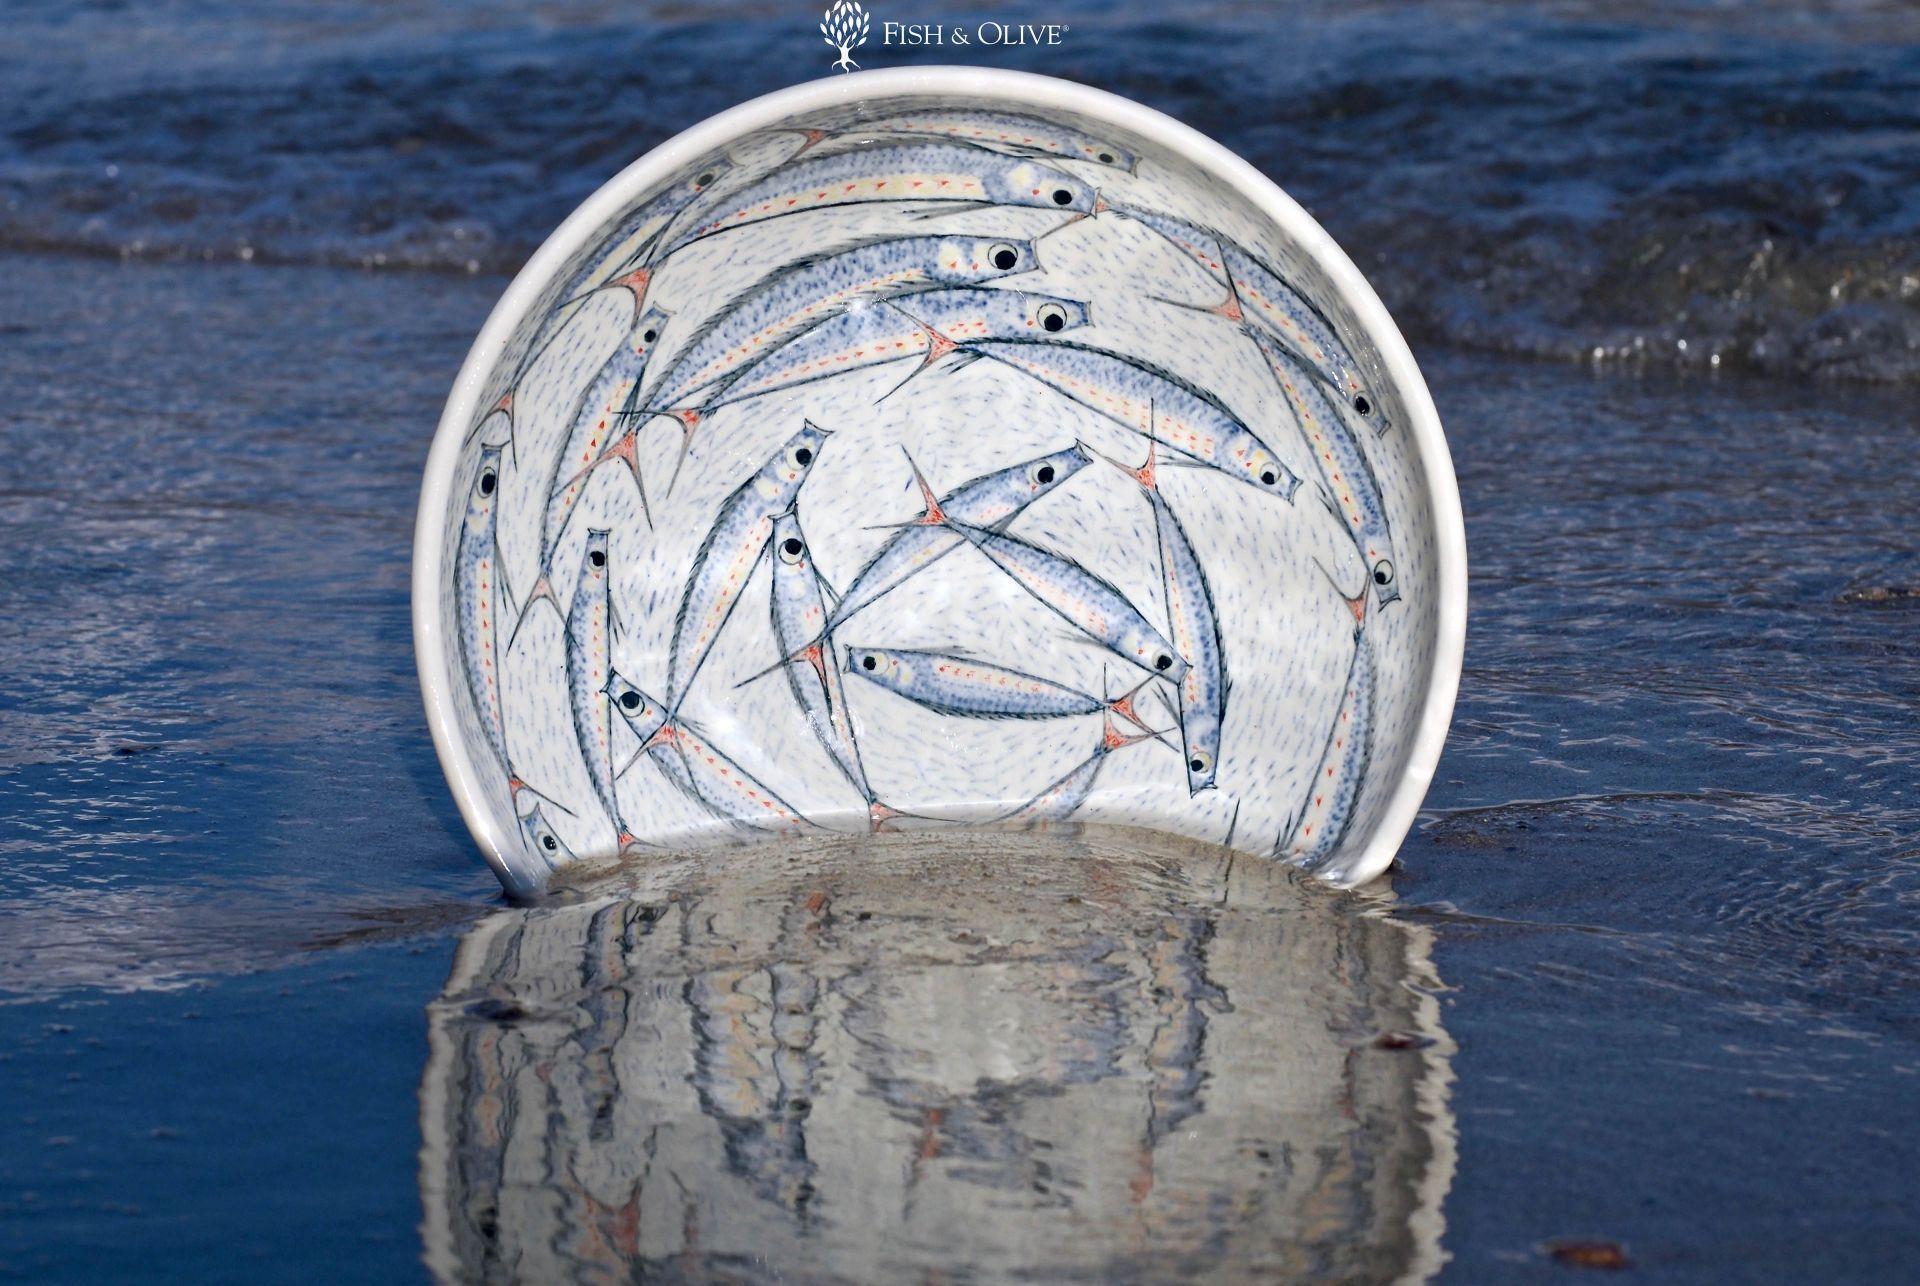 Shopping in Naxos: Fish & Olive Ceramics